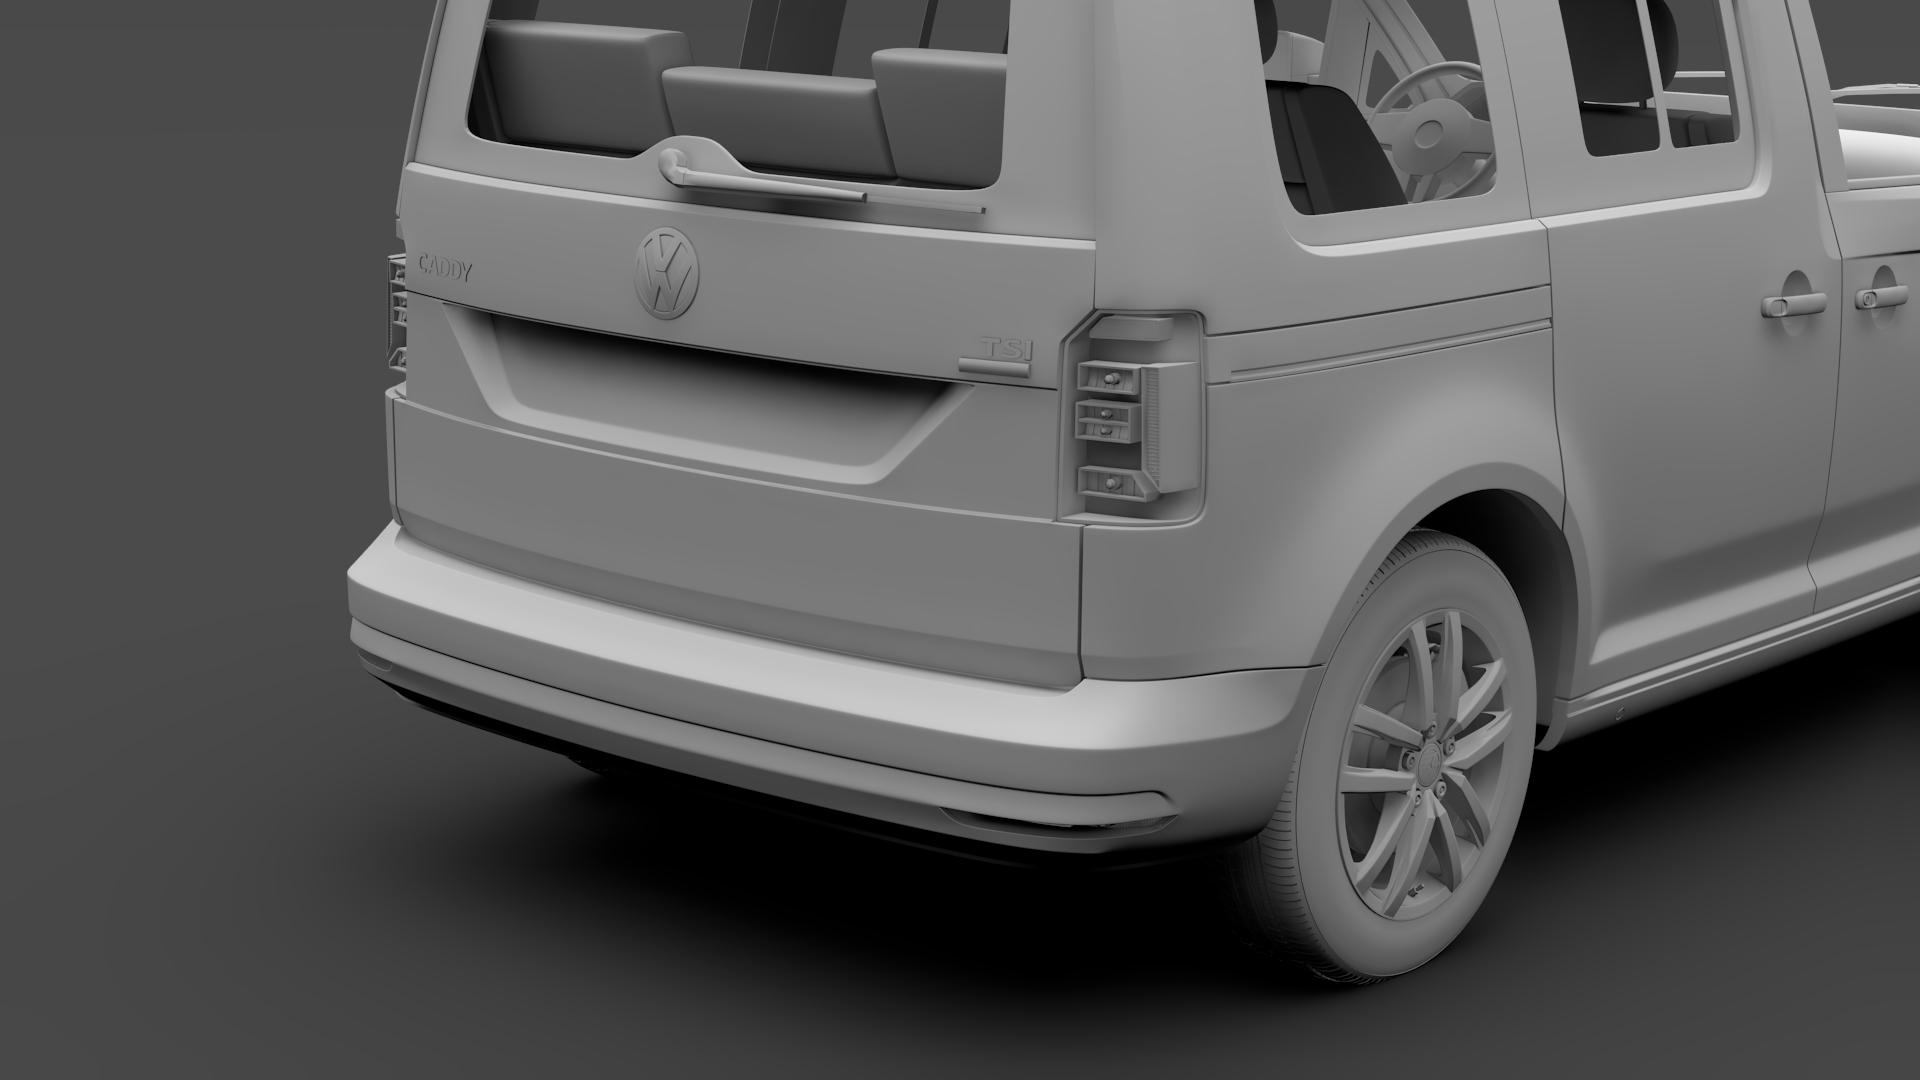 volkswagen caddy 2018 3d model max fbx c4d lwo ma mb hrc xsi obj 283811